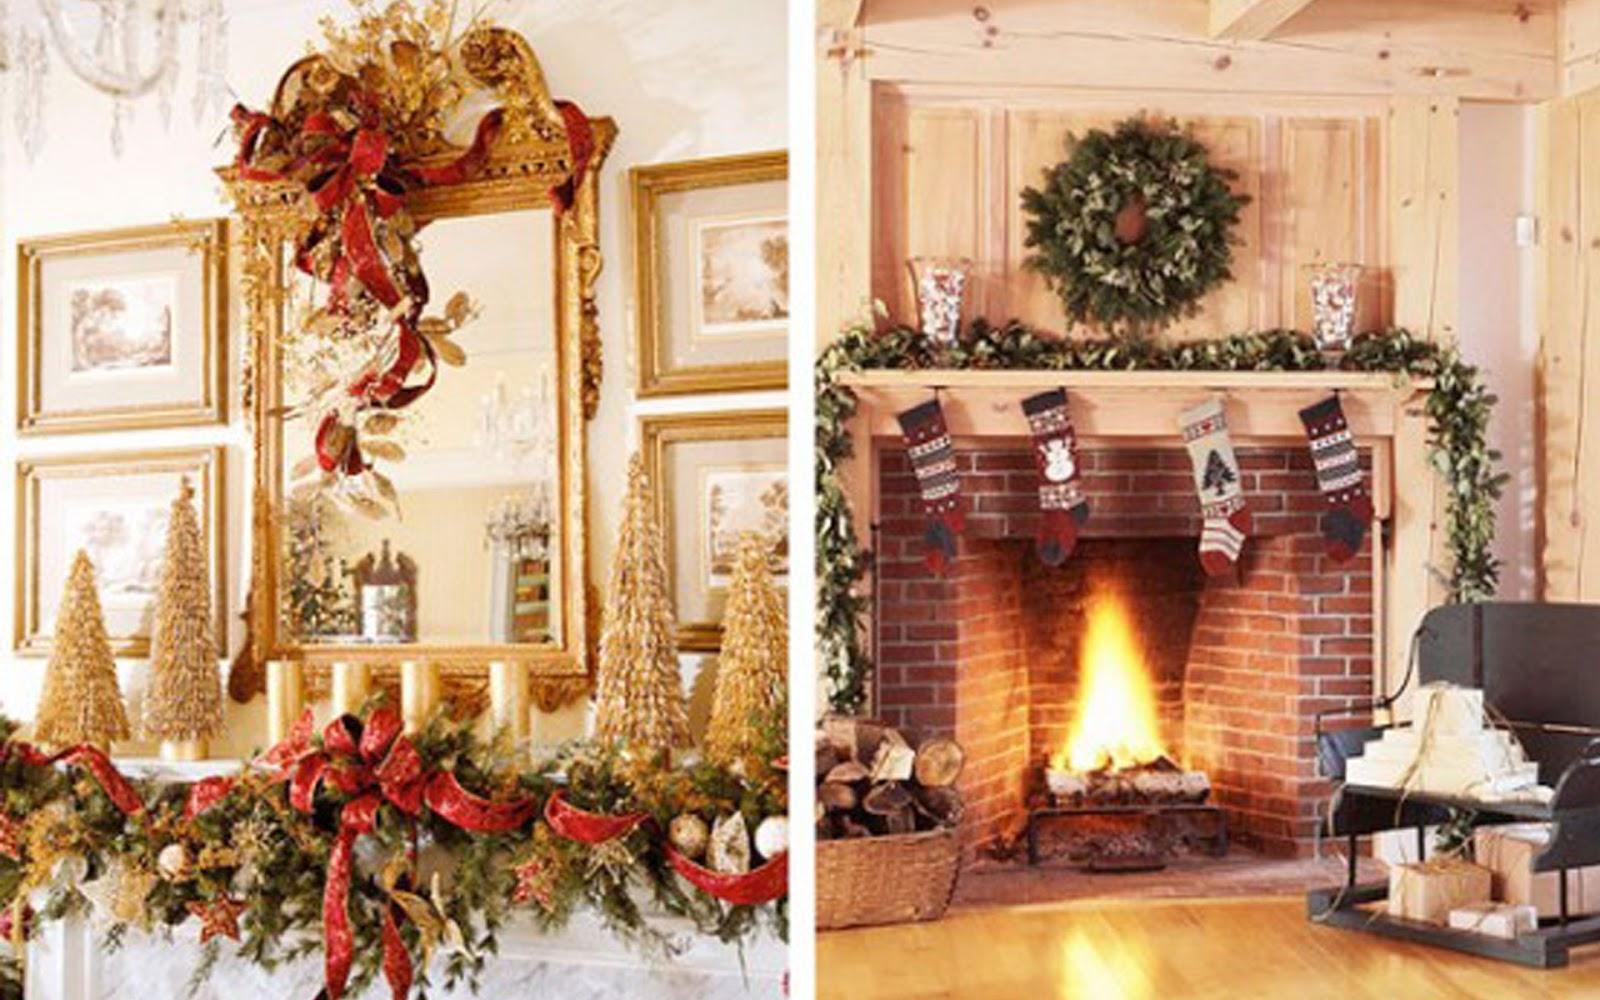 Christmas Hearth Decorations.Wonderful Christmas Mantel Decorating Ideas Room Decor Diy